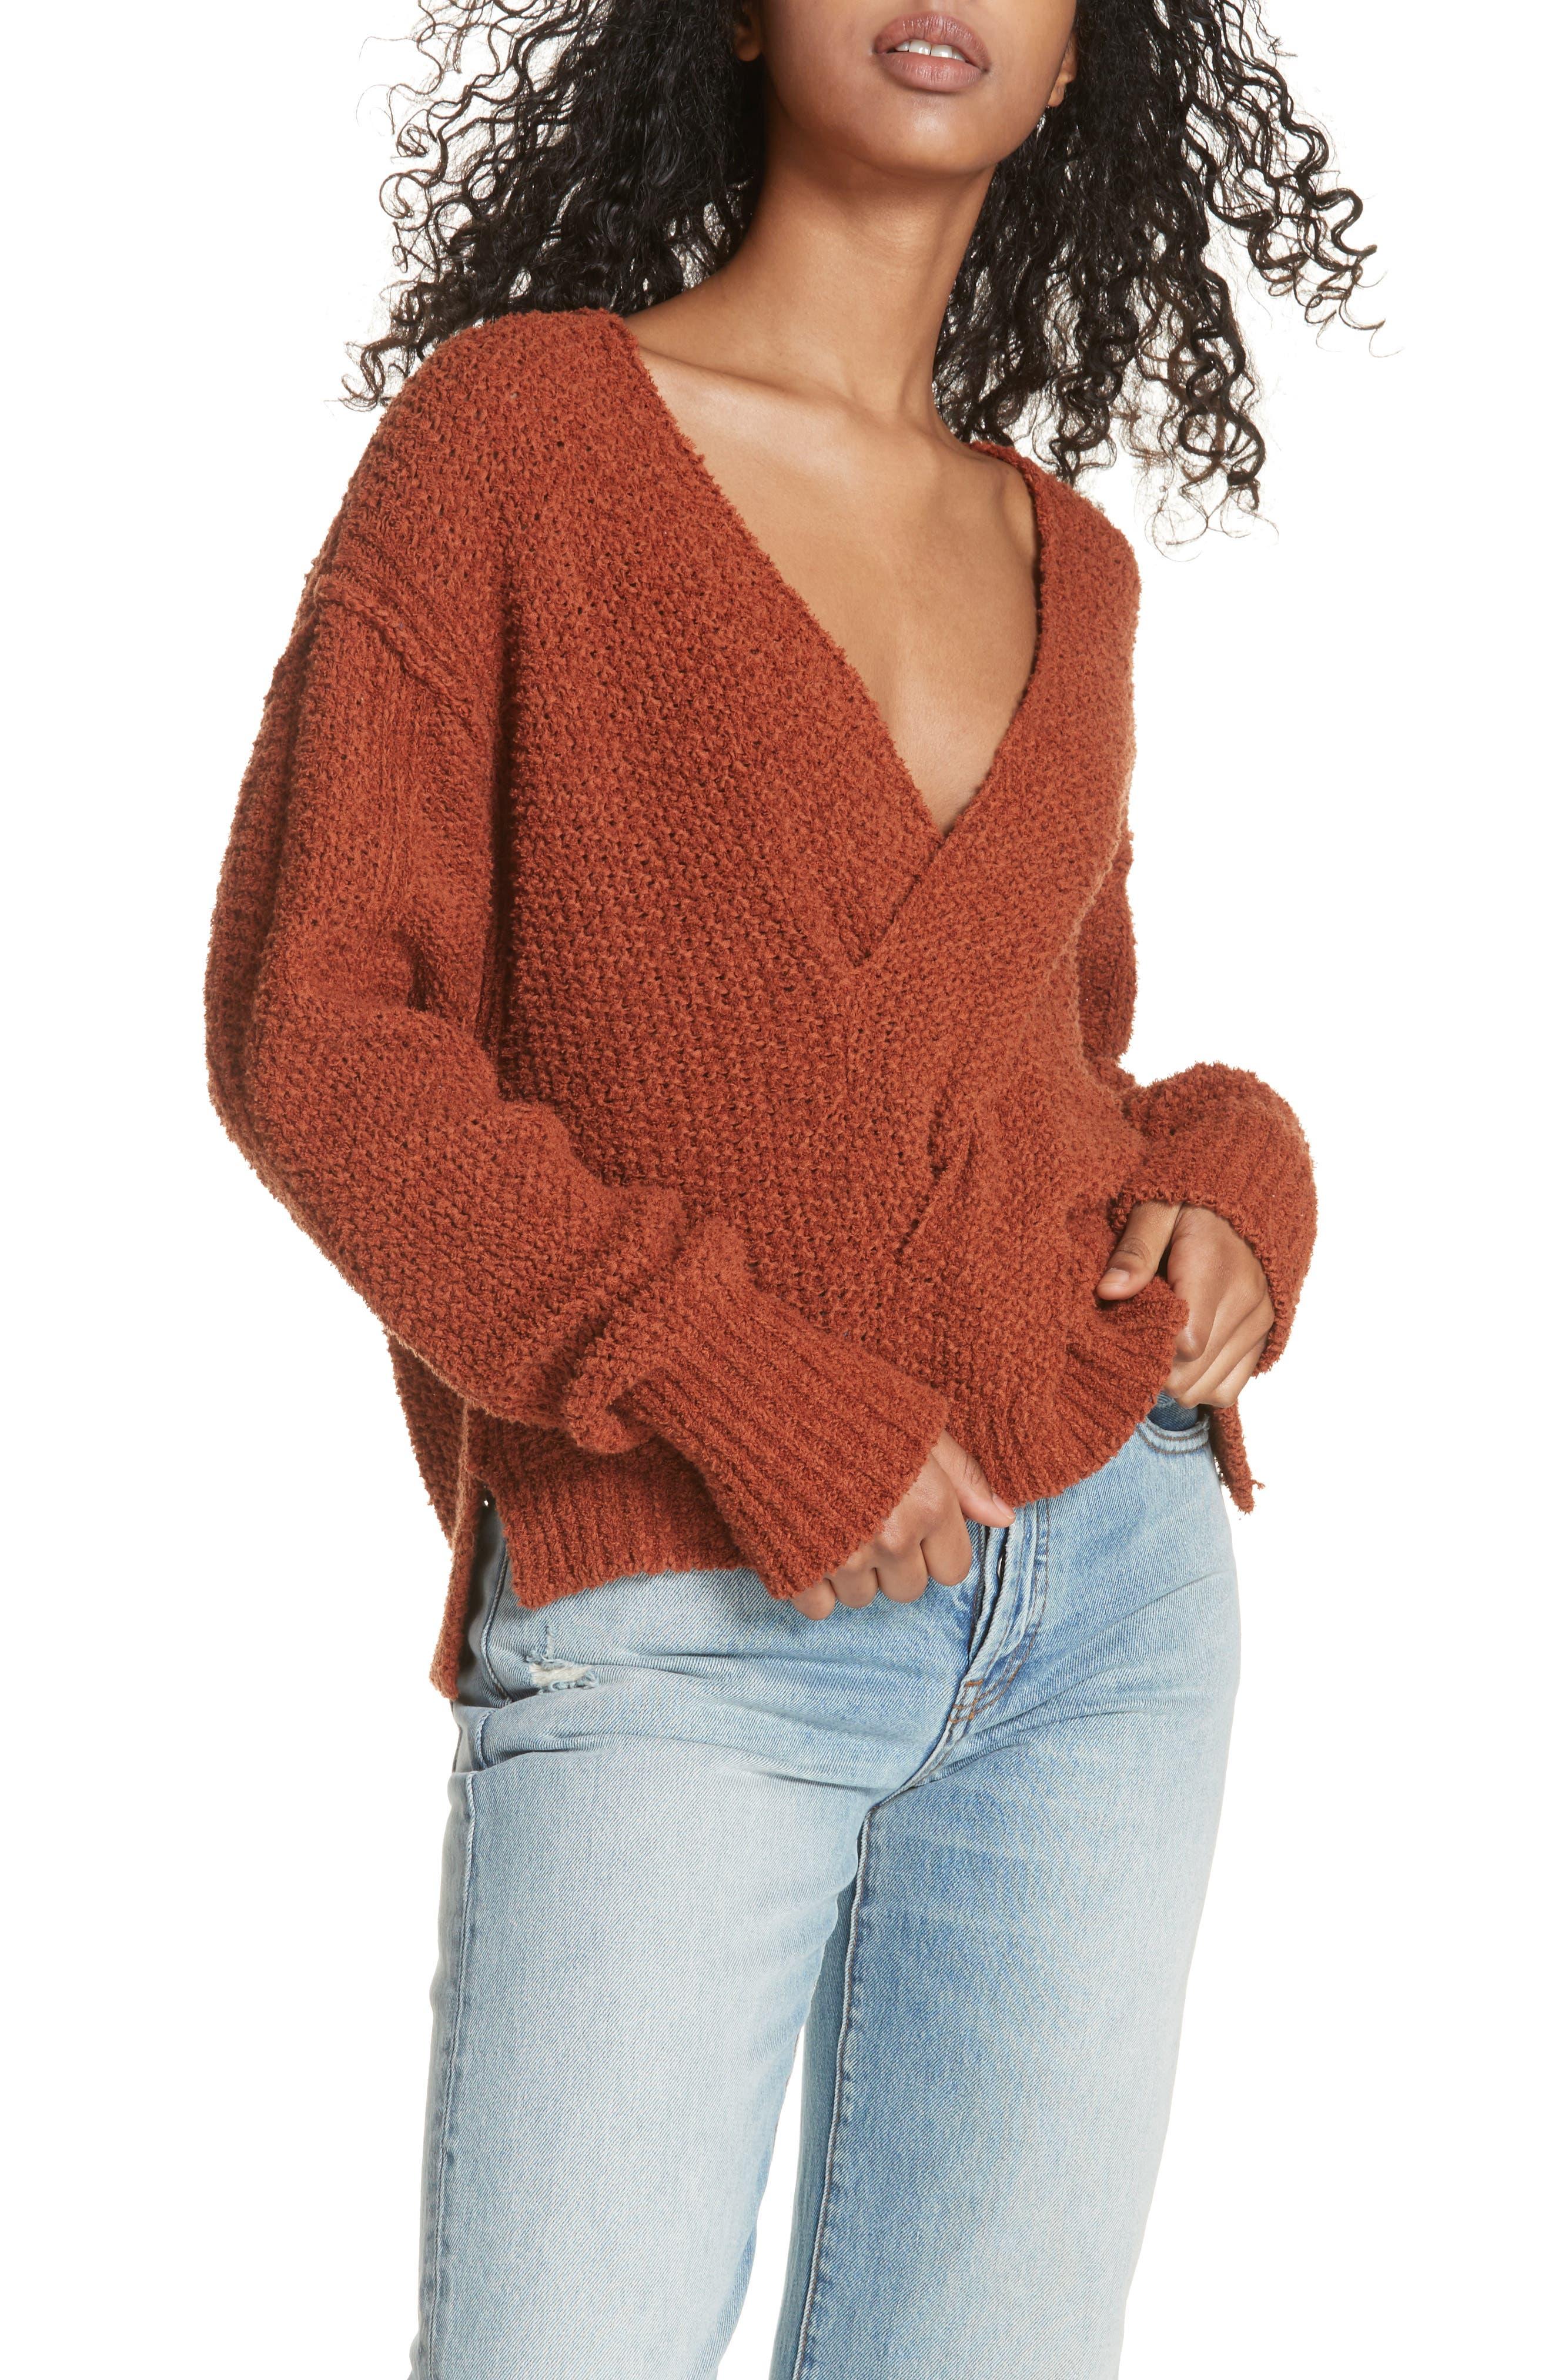 Coco V-Neck Sweater,                             Main thumbnail 1, color,                             Terracotta